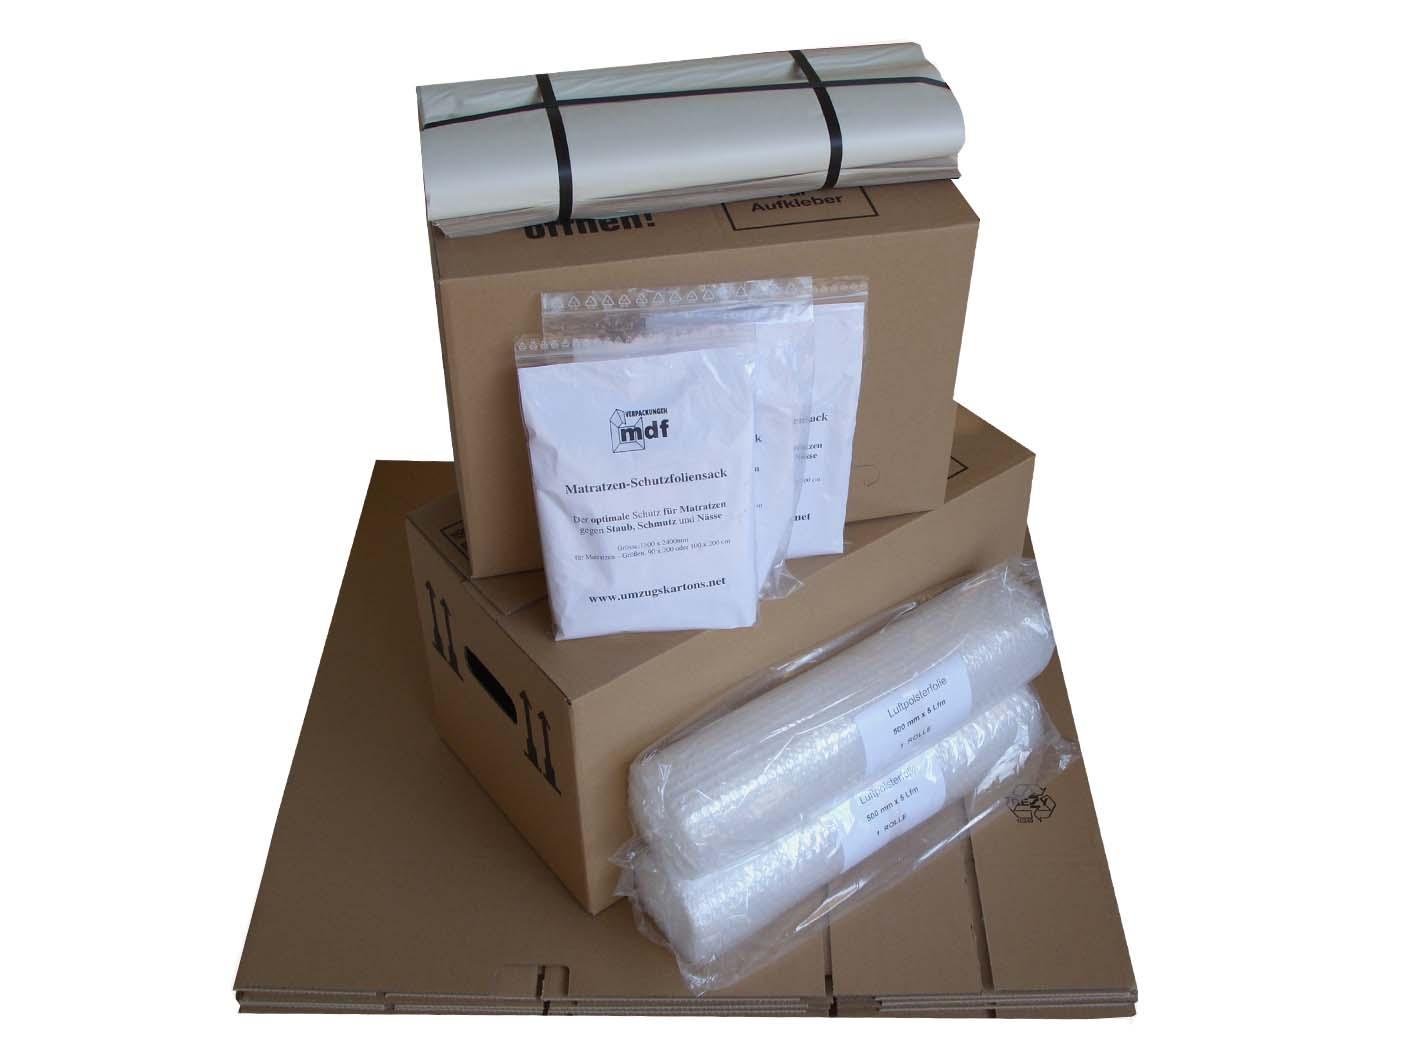 Umzugs-Komplett Paket PARTNER 2